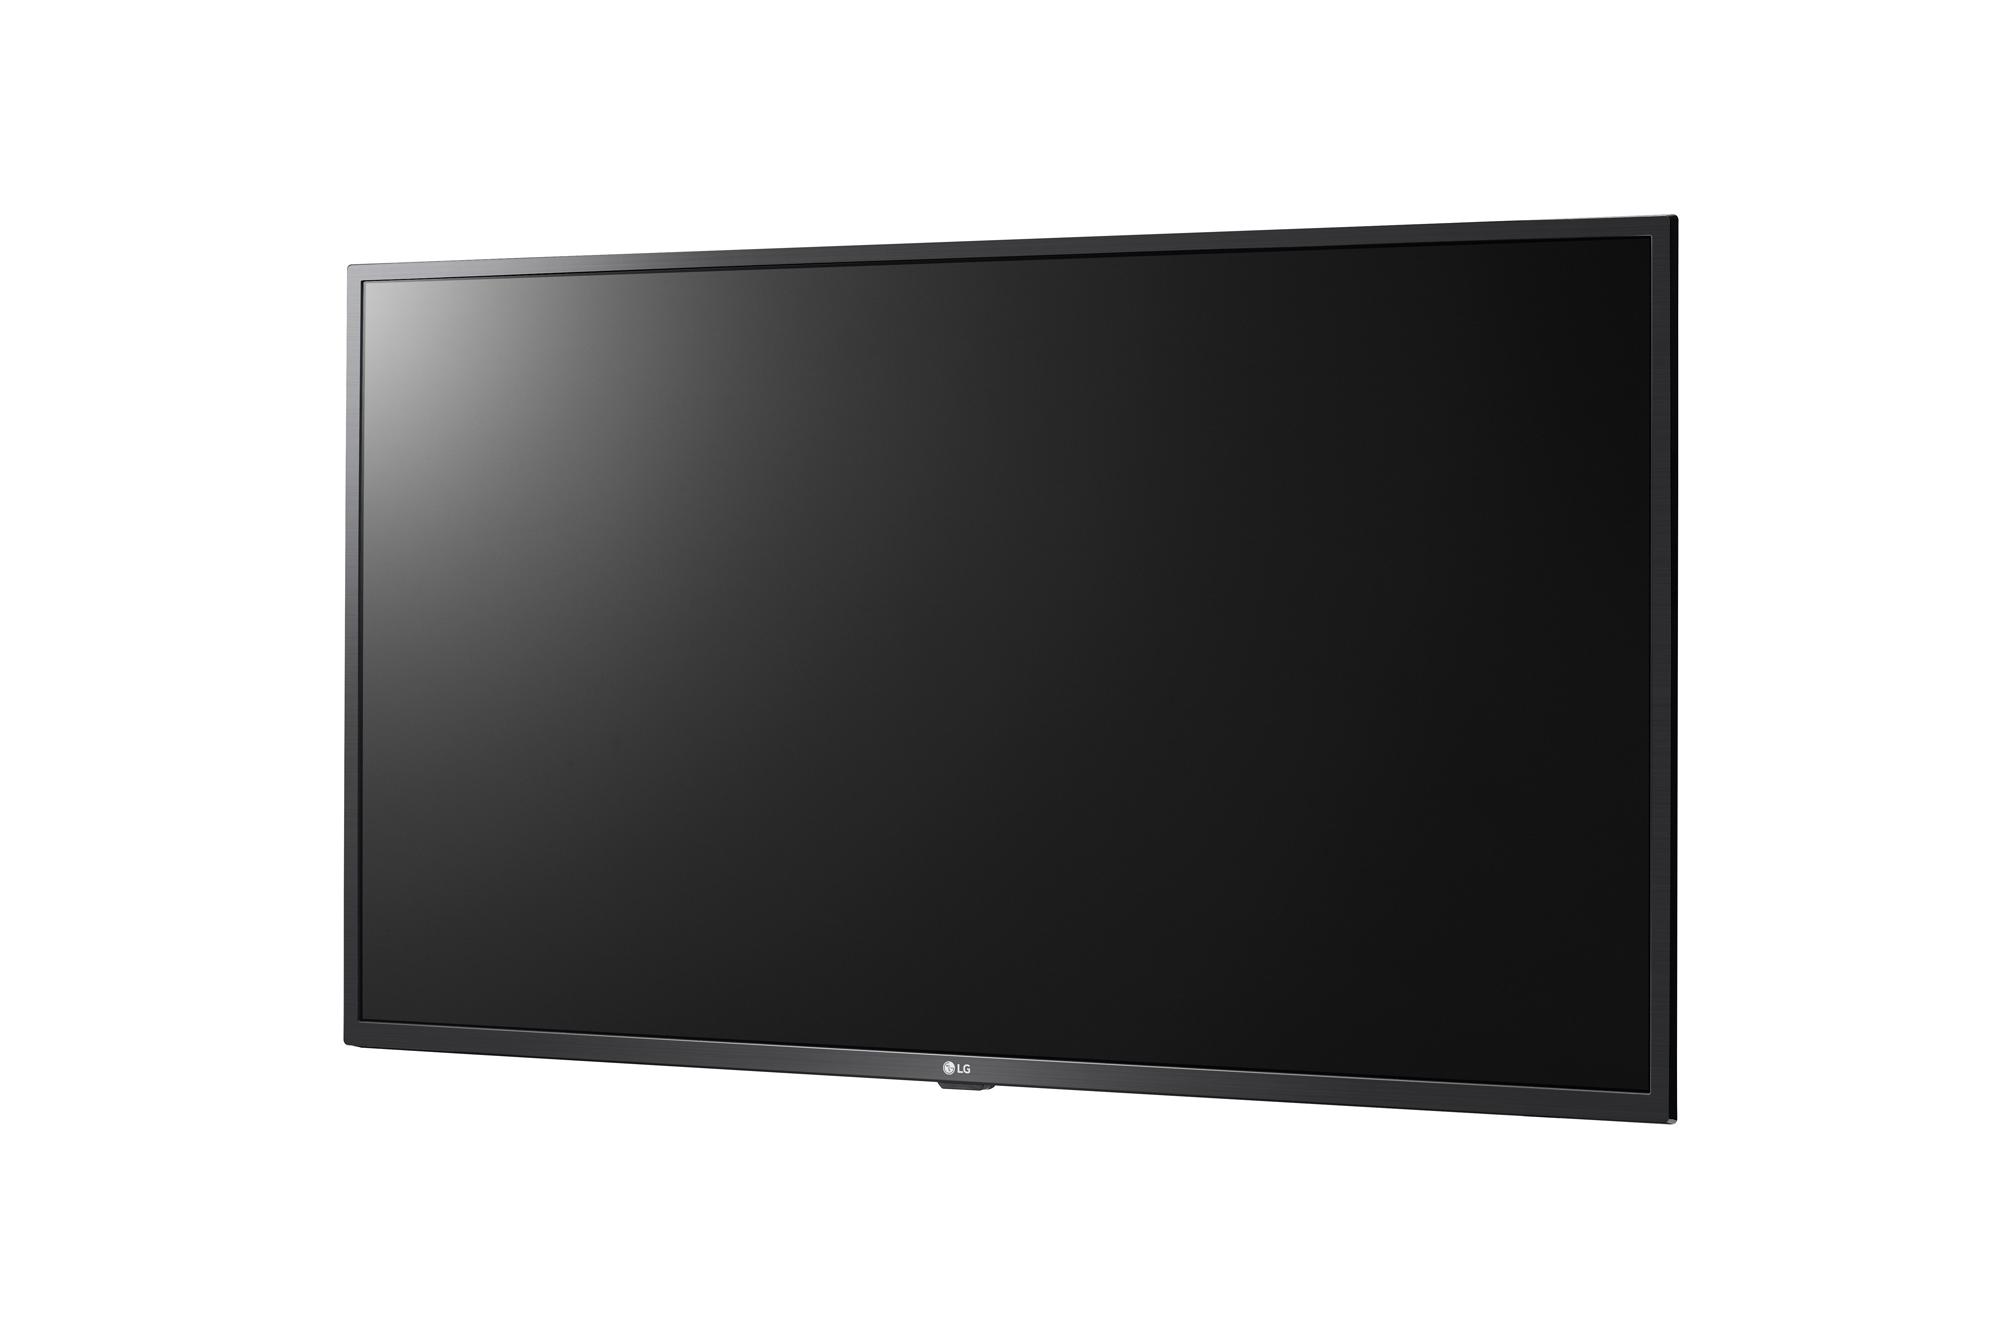 LG Smart TV Signage 43UT640S (CIS) 3